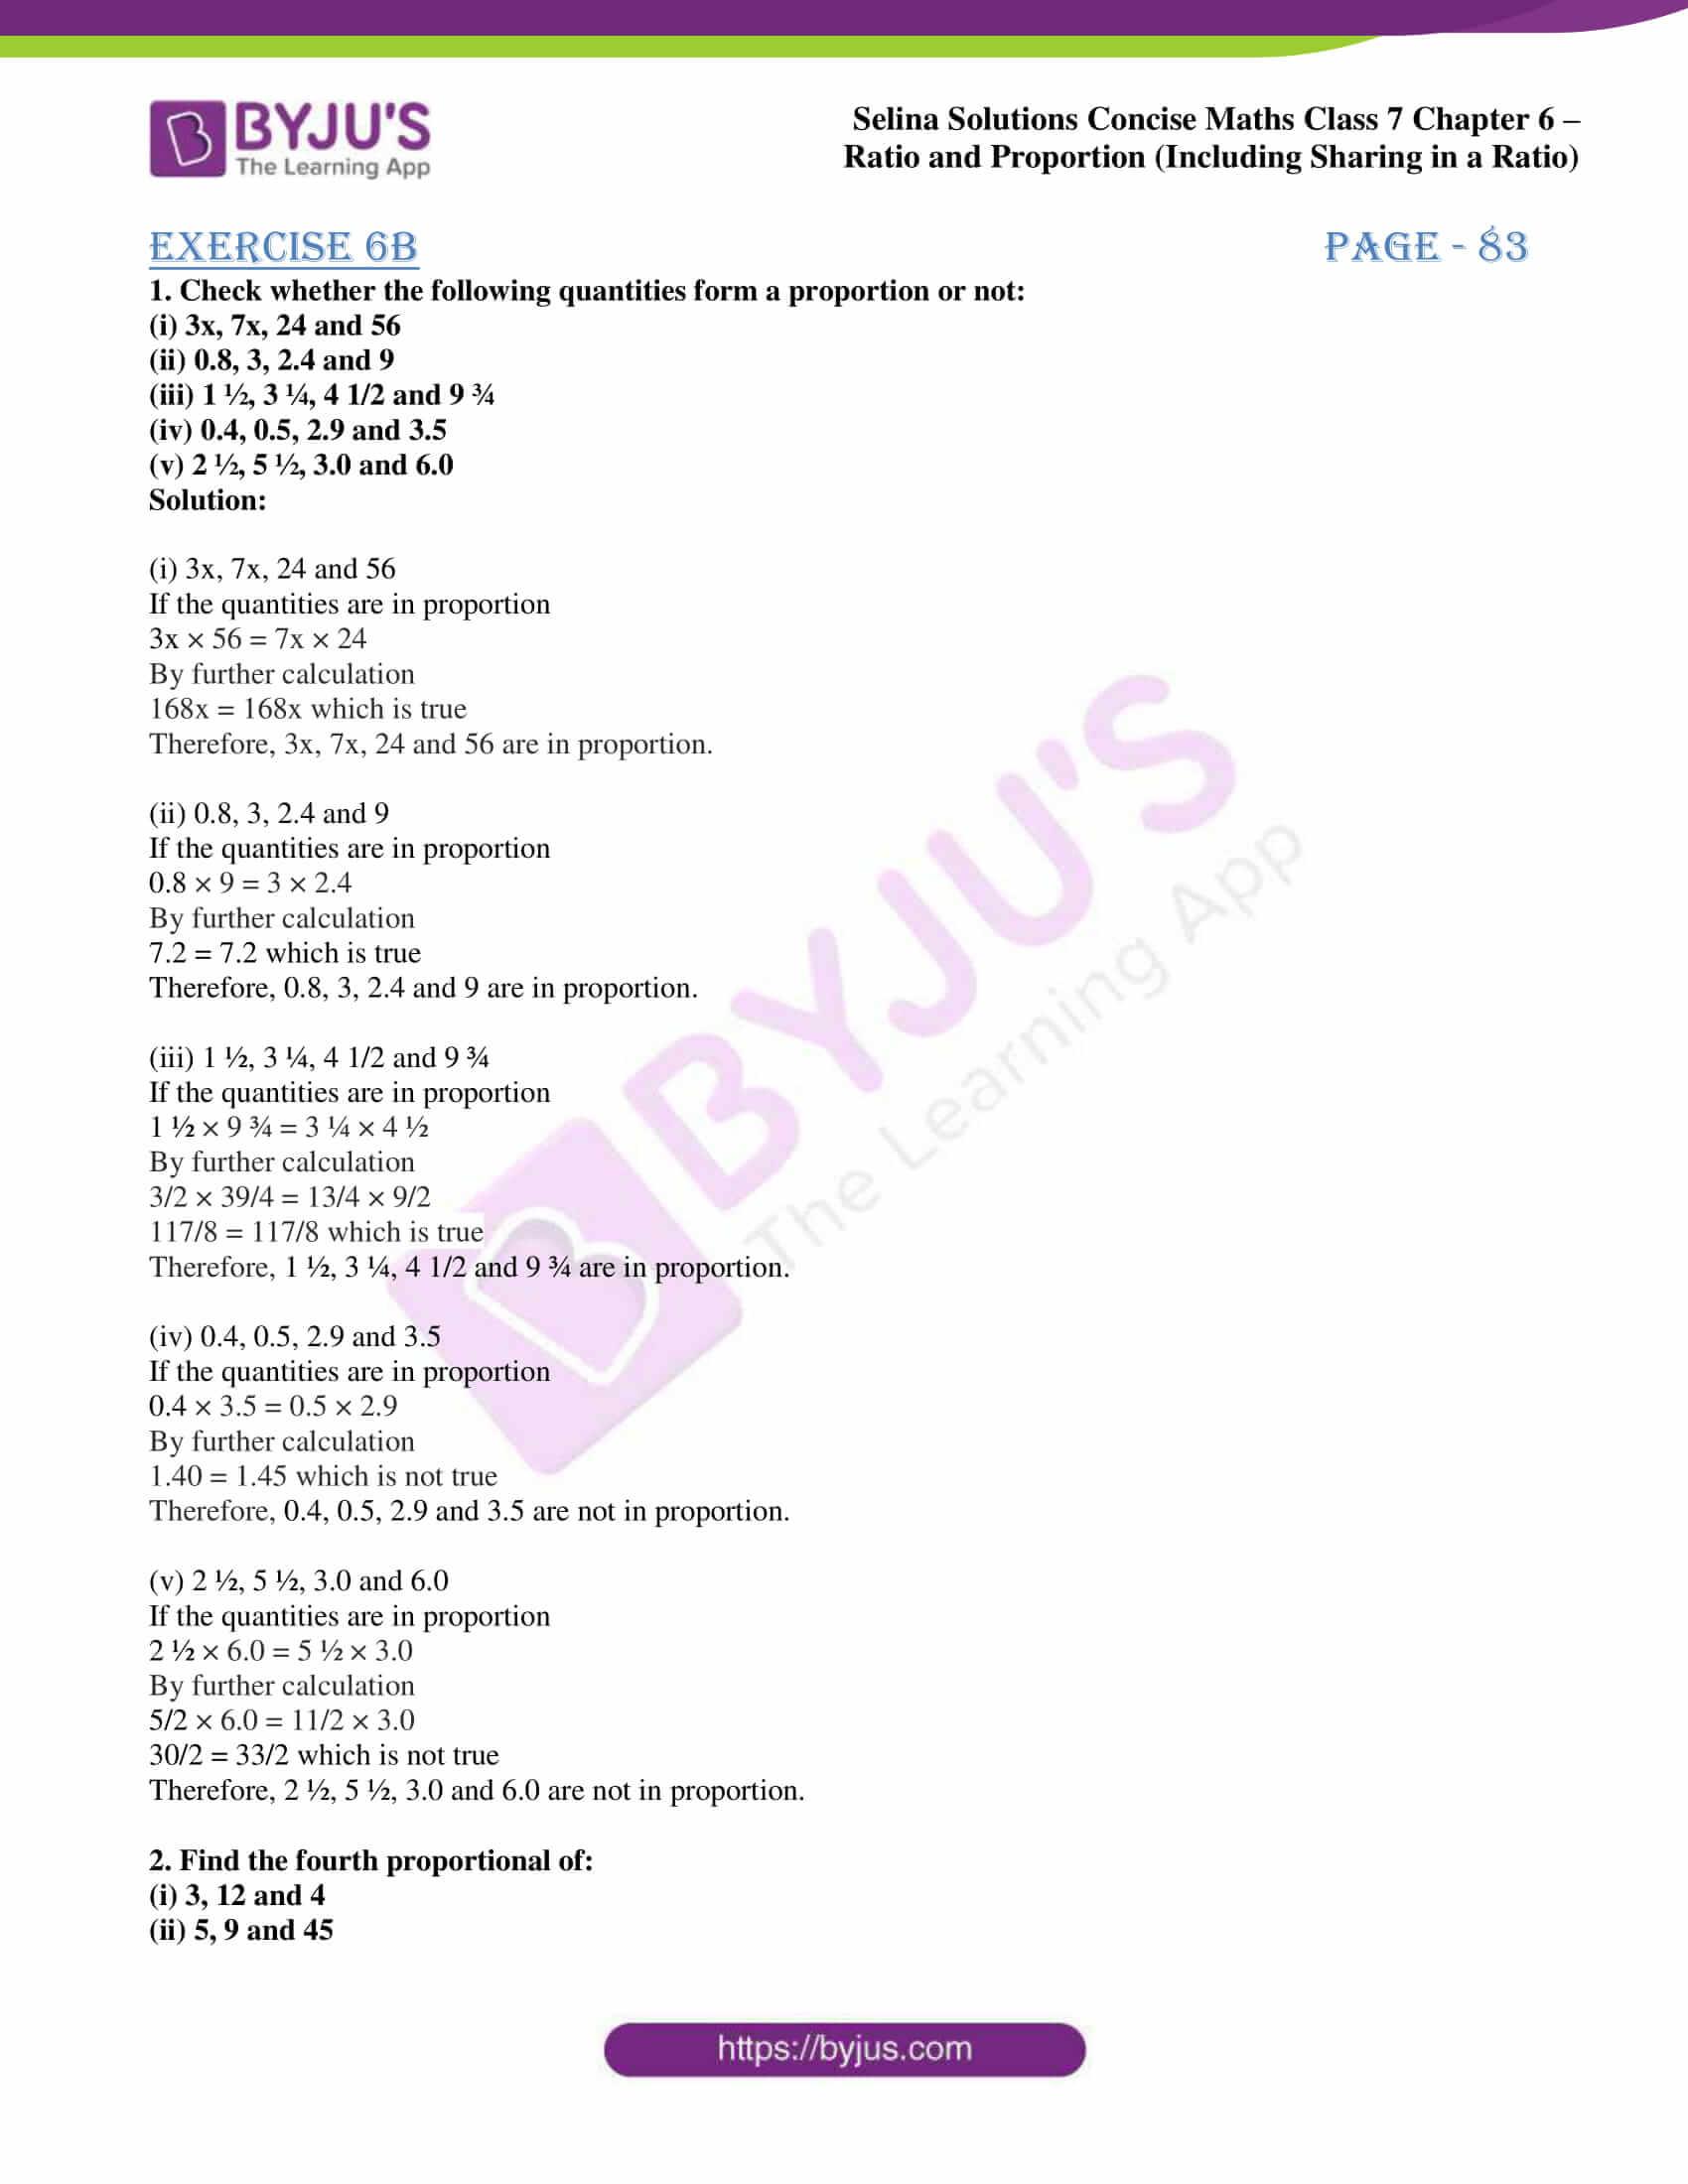 selina sol concise maths class 7 ch6 ex 6b 1